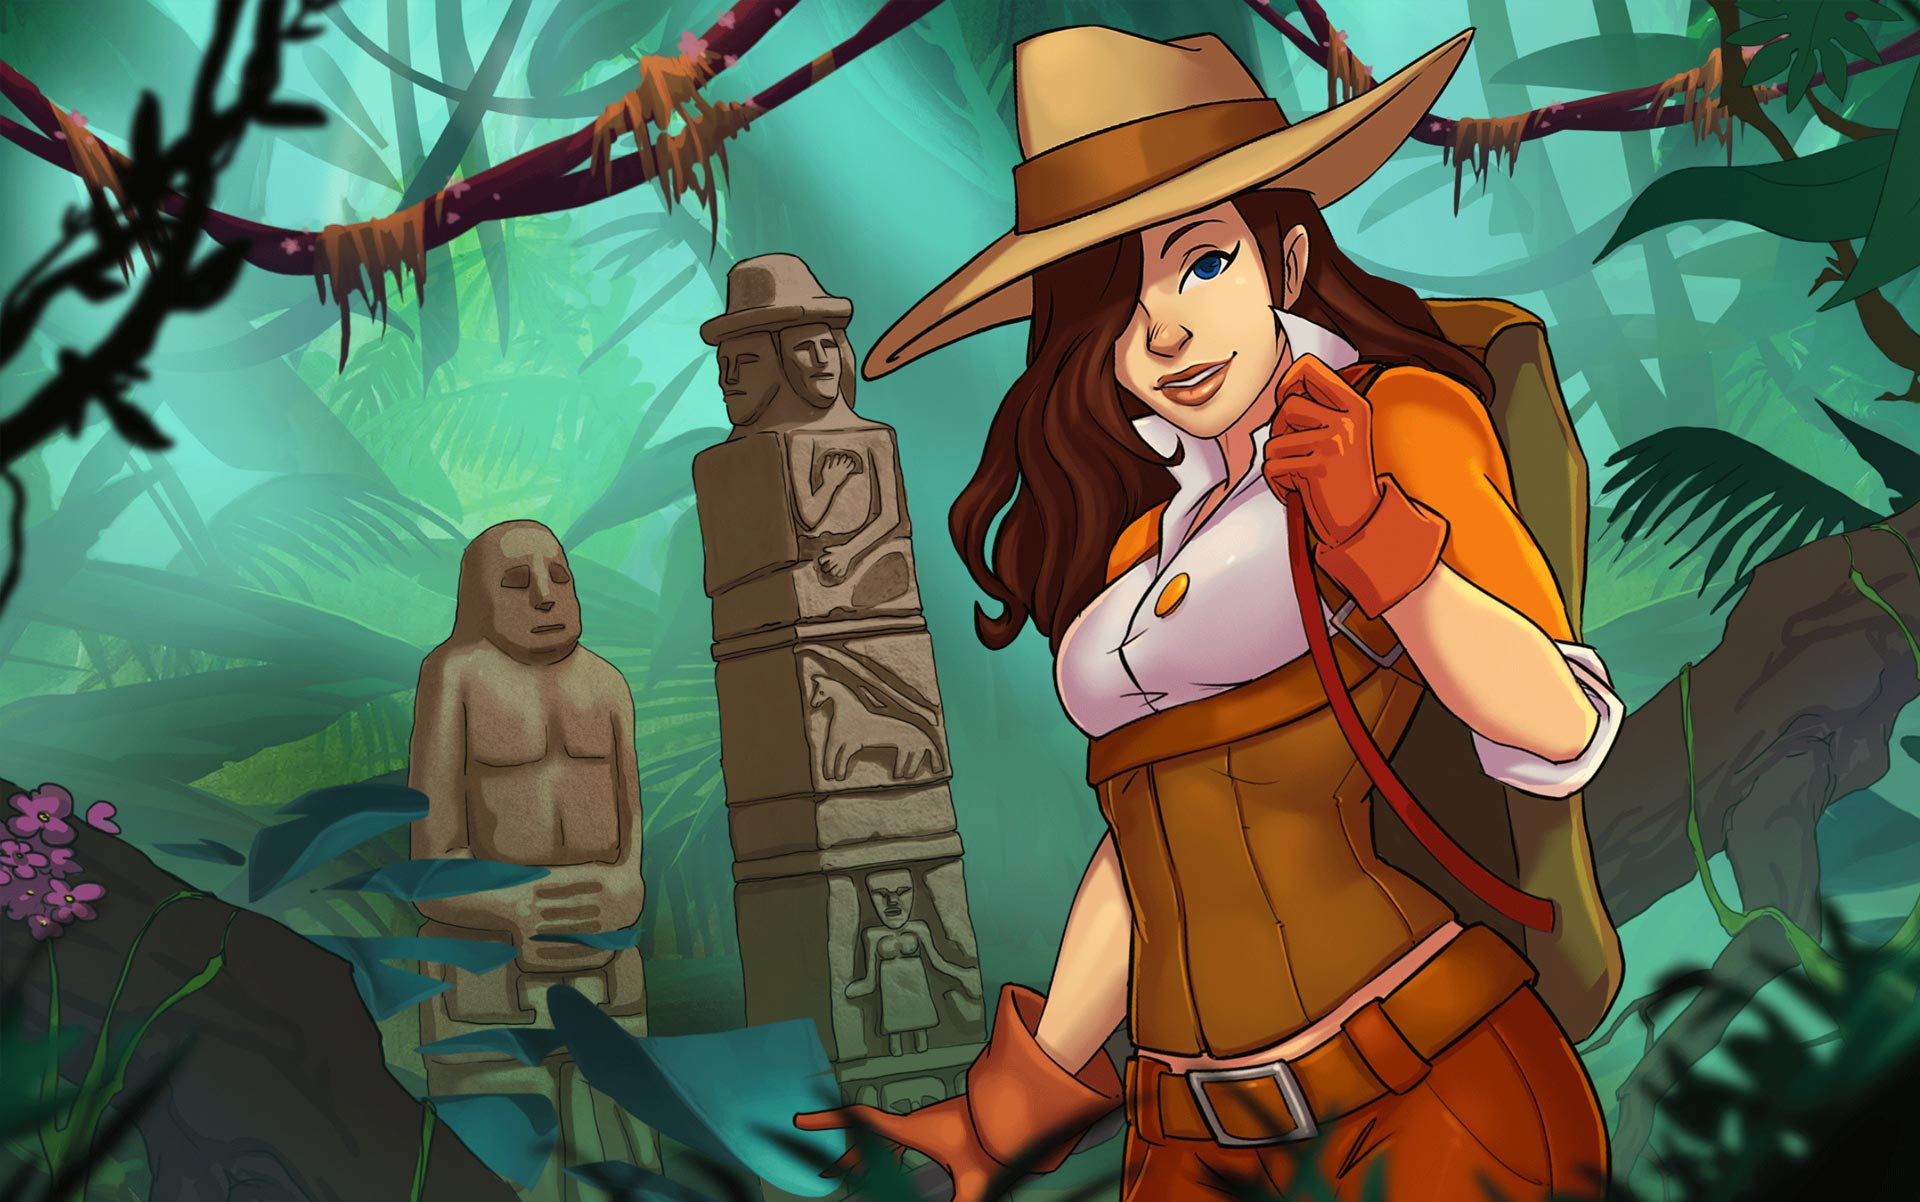 Alicia Quatermain 4 - Da Vinci and the Time Machine Collector's Edition - GameHouse Premiere Exclusive